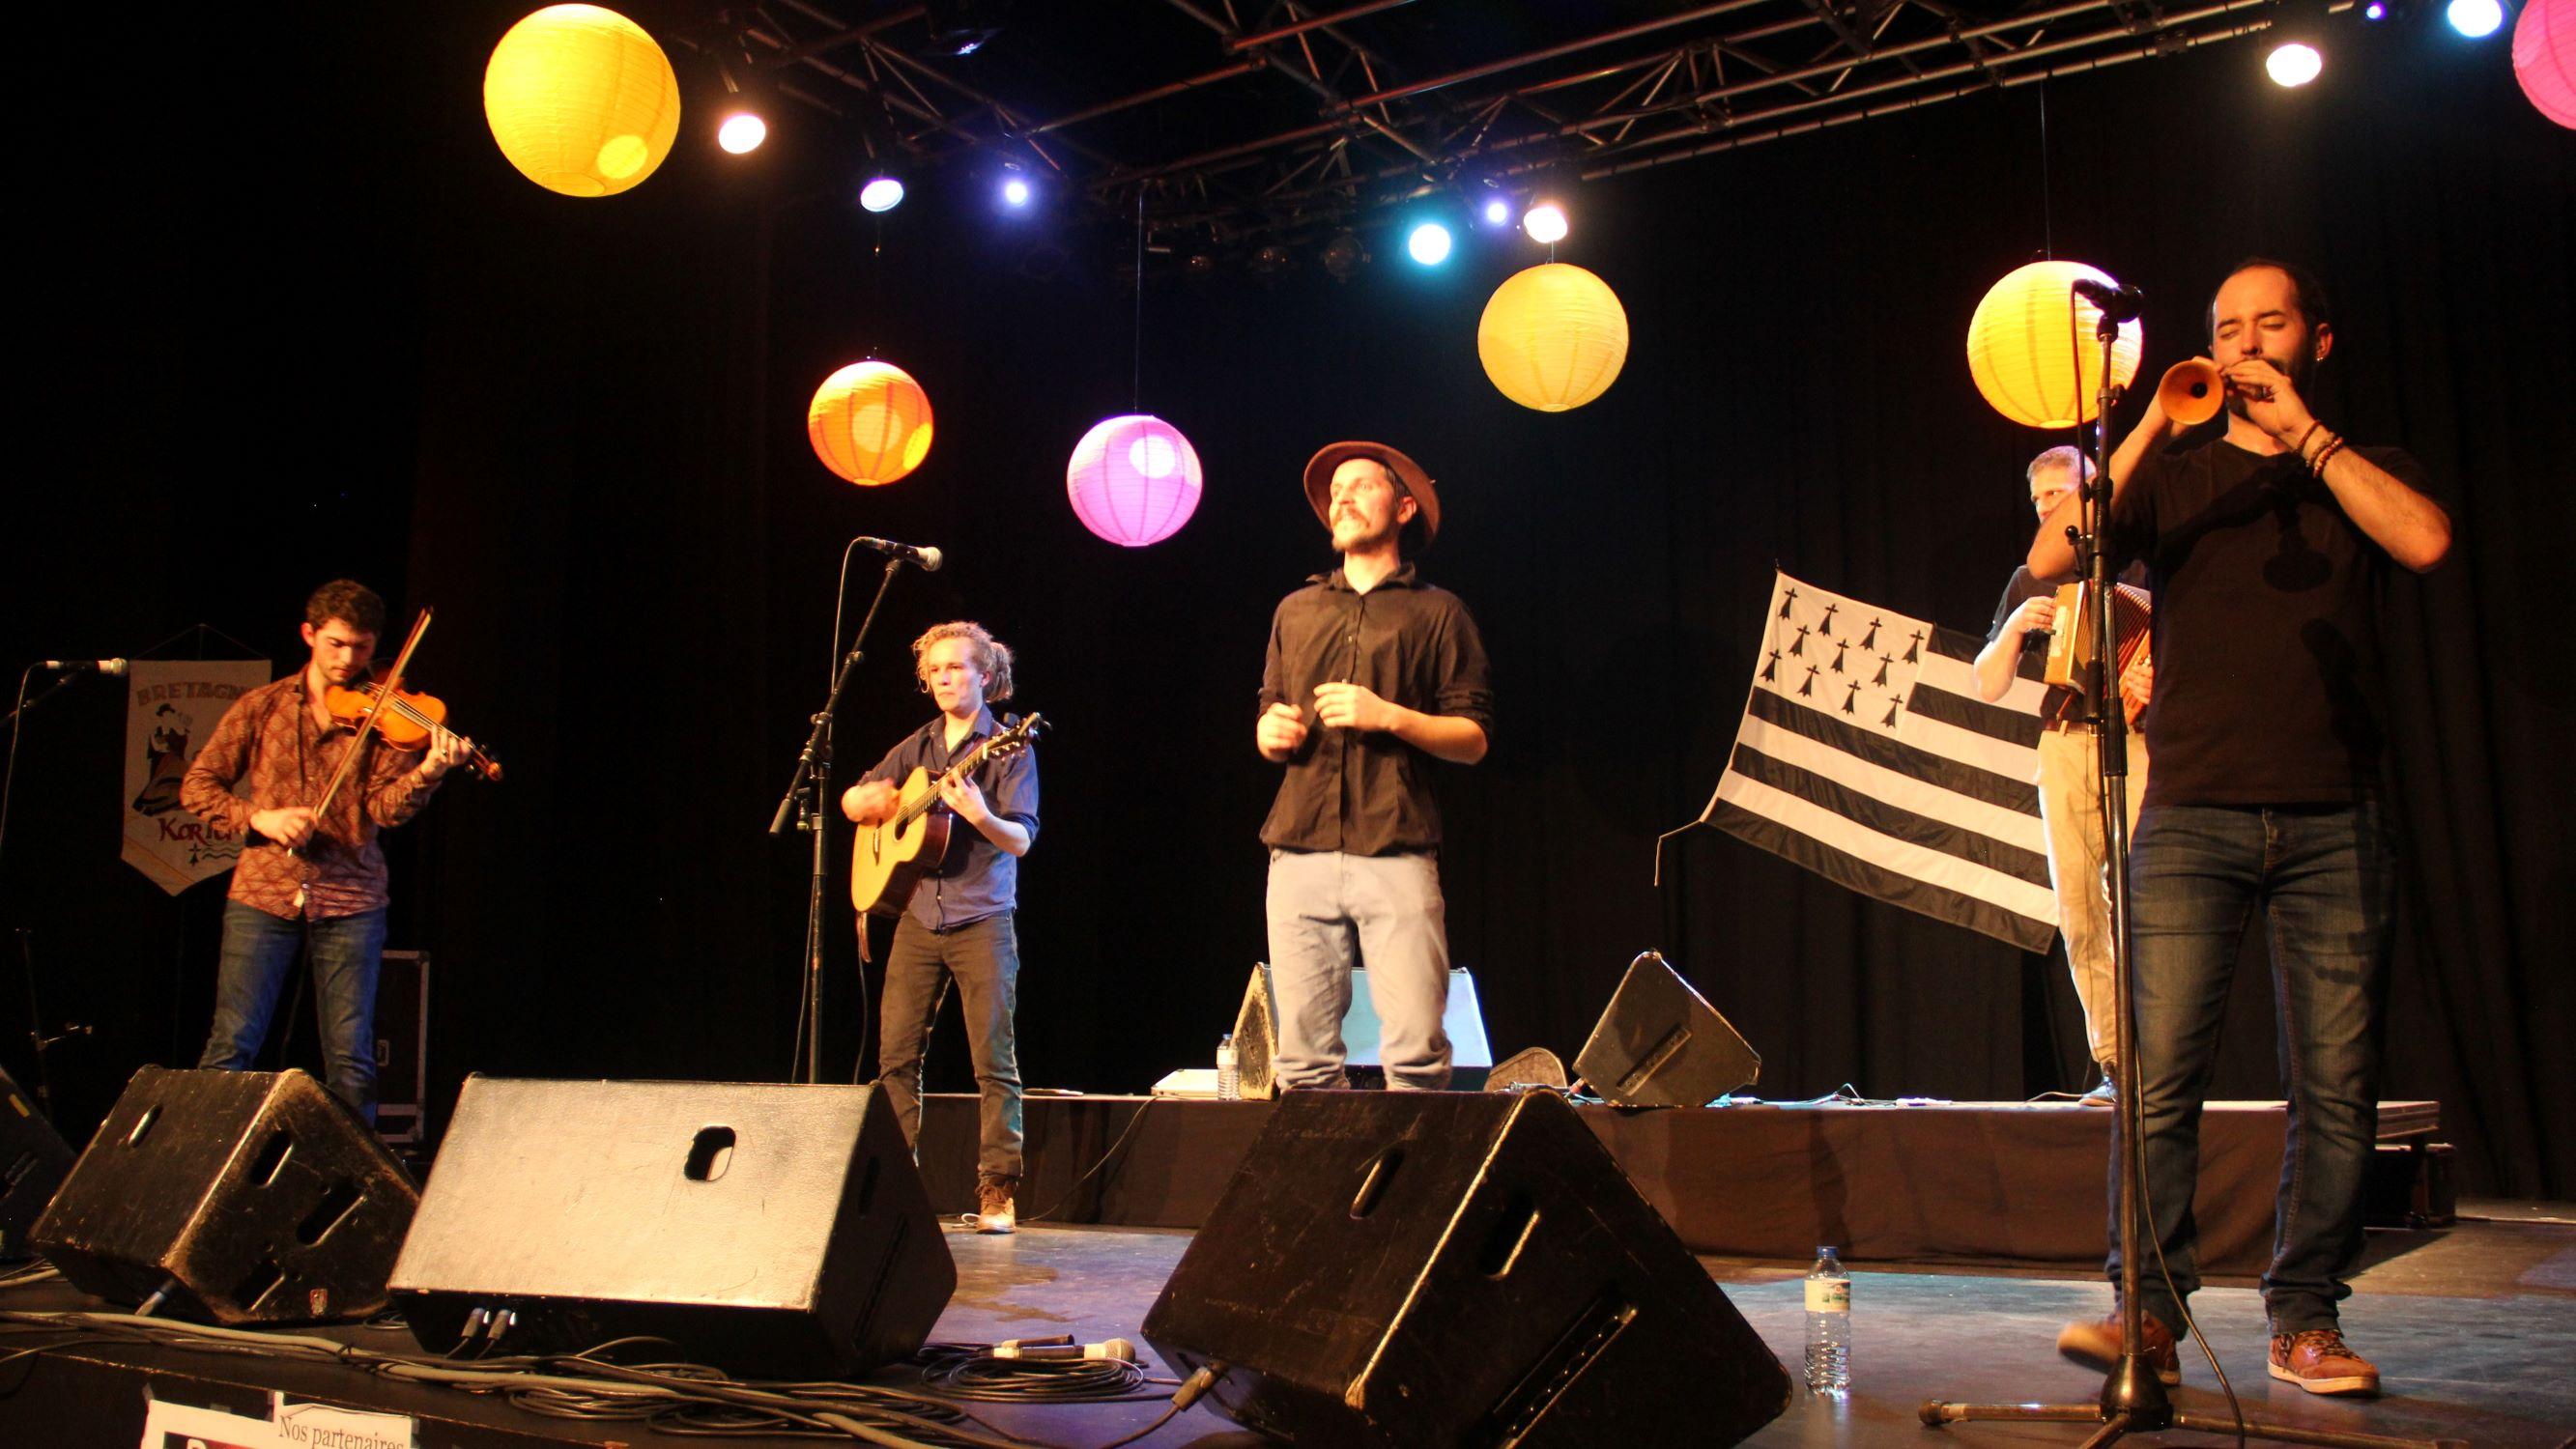 2020-02-01-Fest-Noz-Anniversaire-40-ans-Koria-Fest-Noz-05L